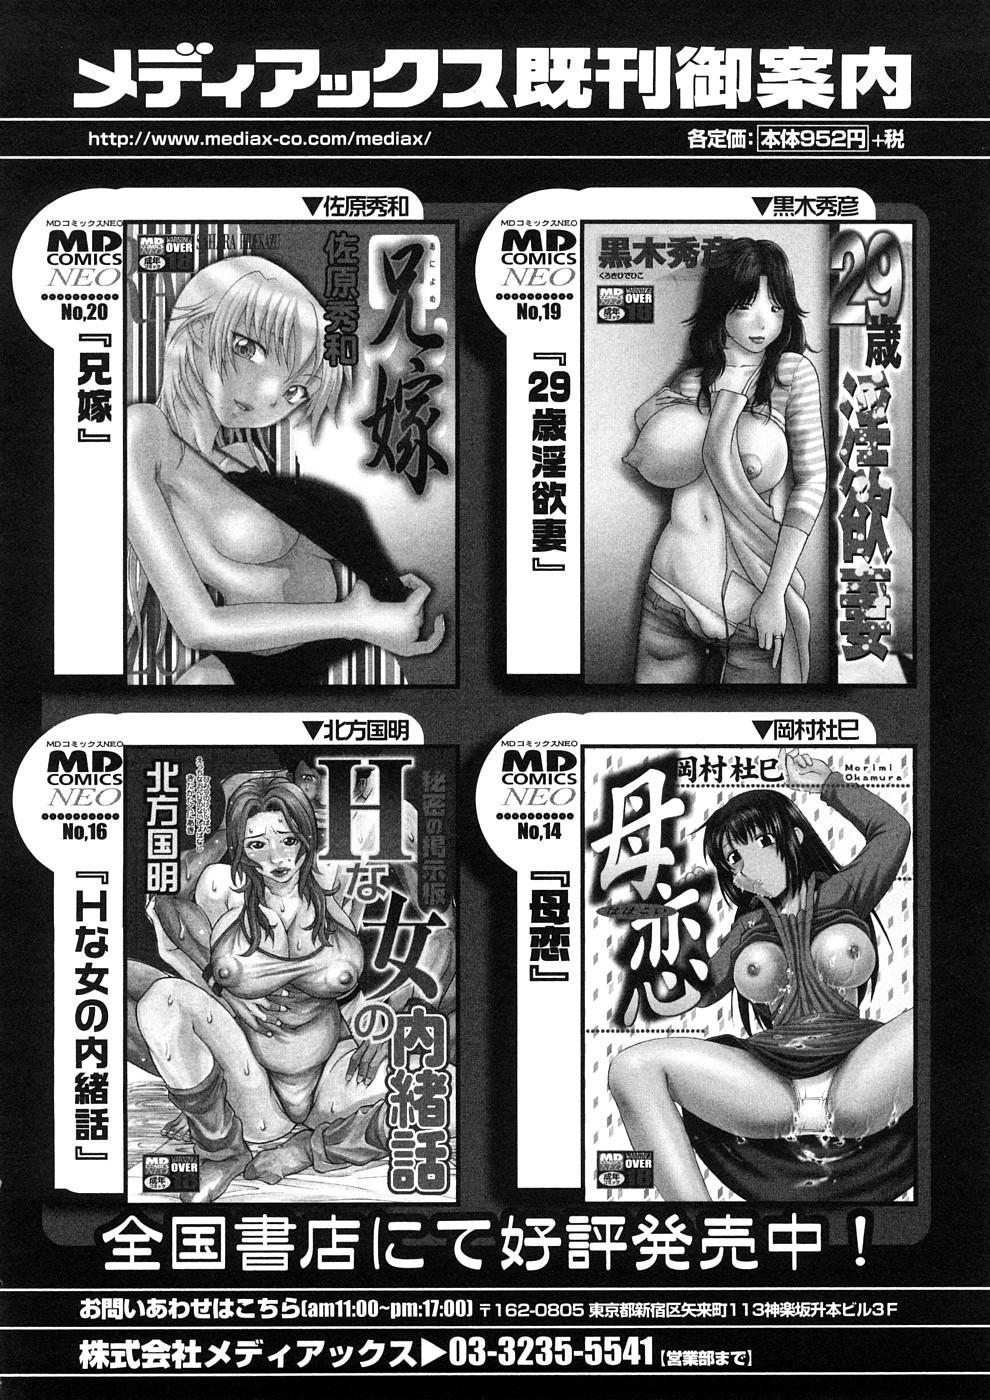 Geki Yaba Anthology Vol. 1 - Naka ni Dashite yo 236